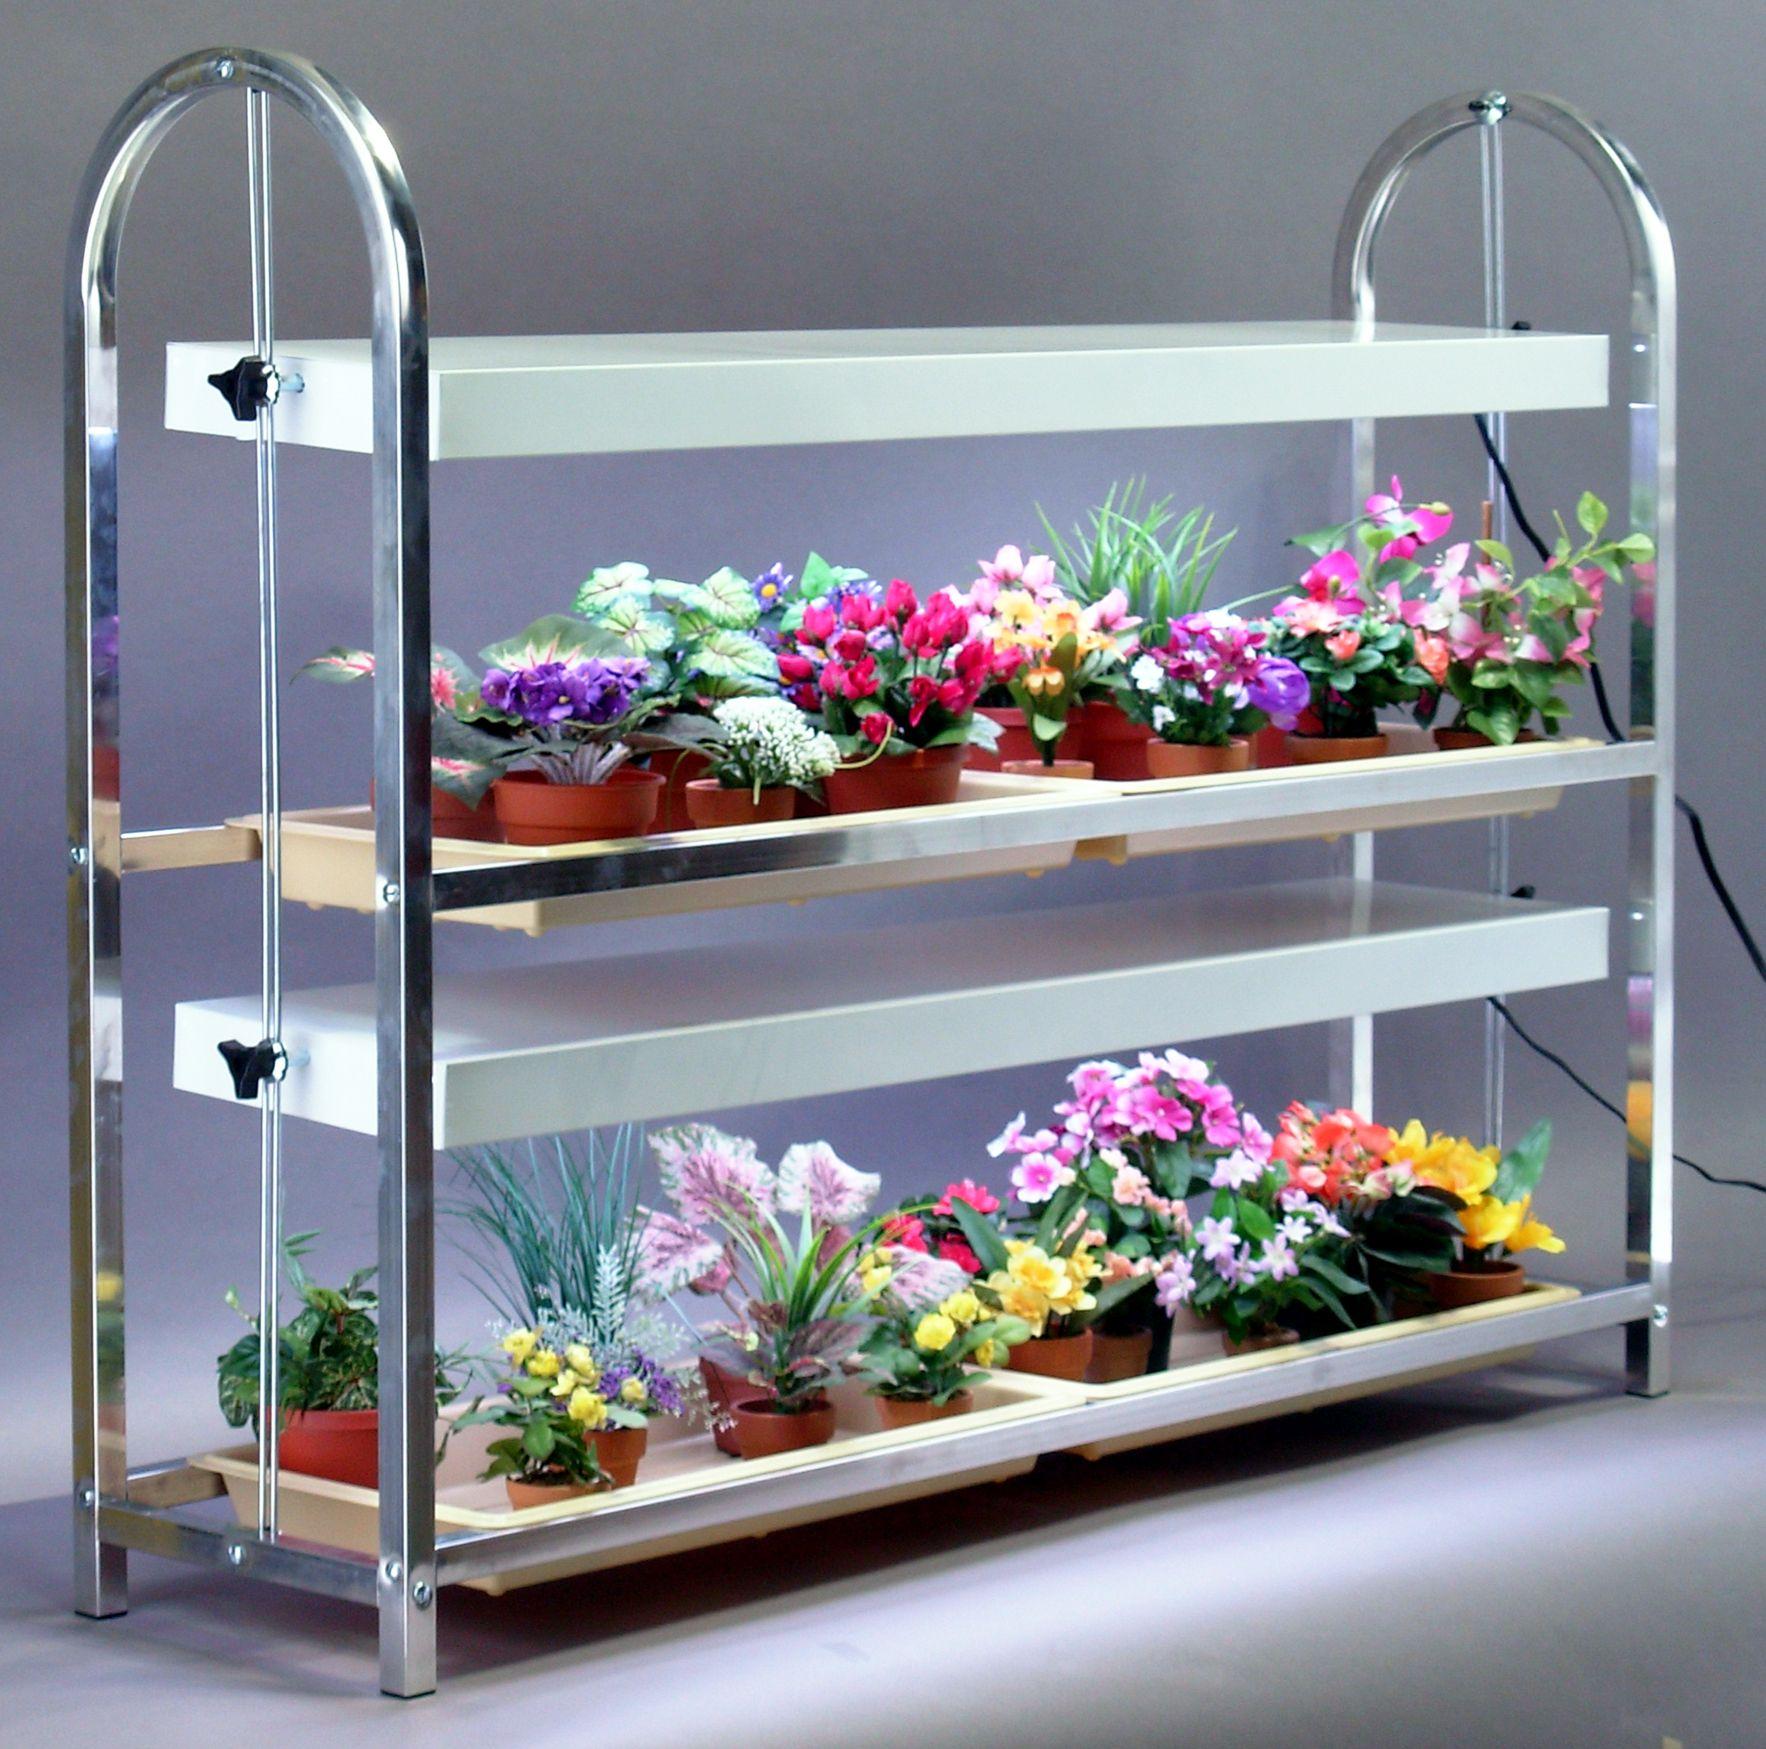 G24AT8 Compact Lite Cart (Aluminum) Indoor gardening